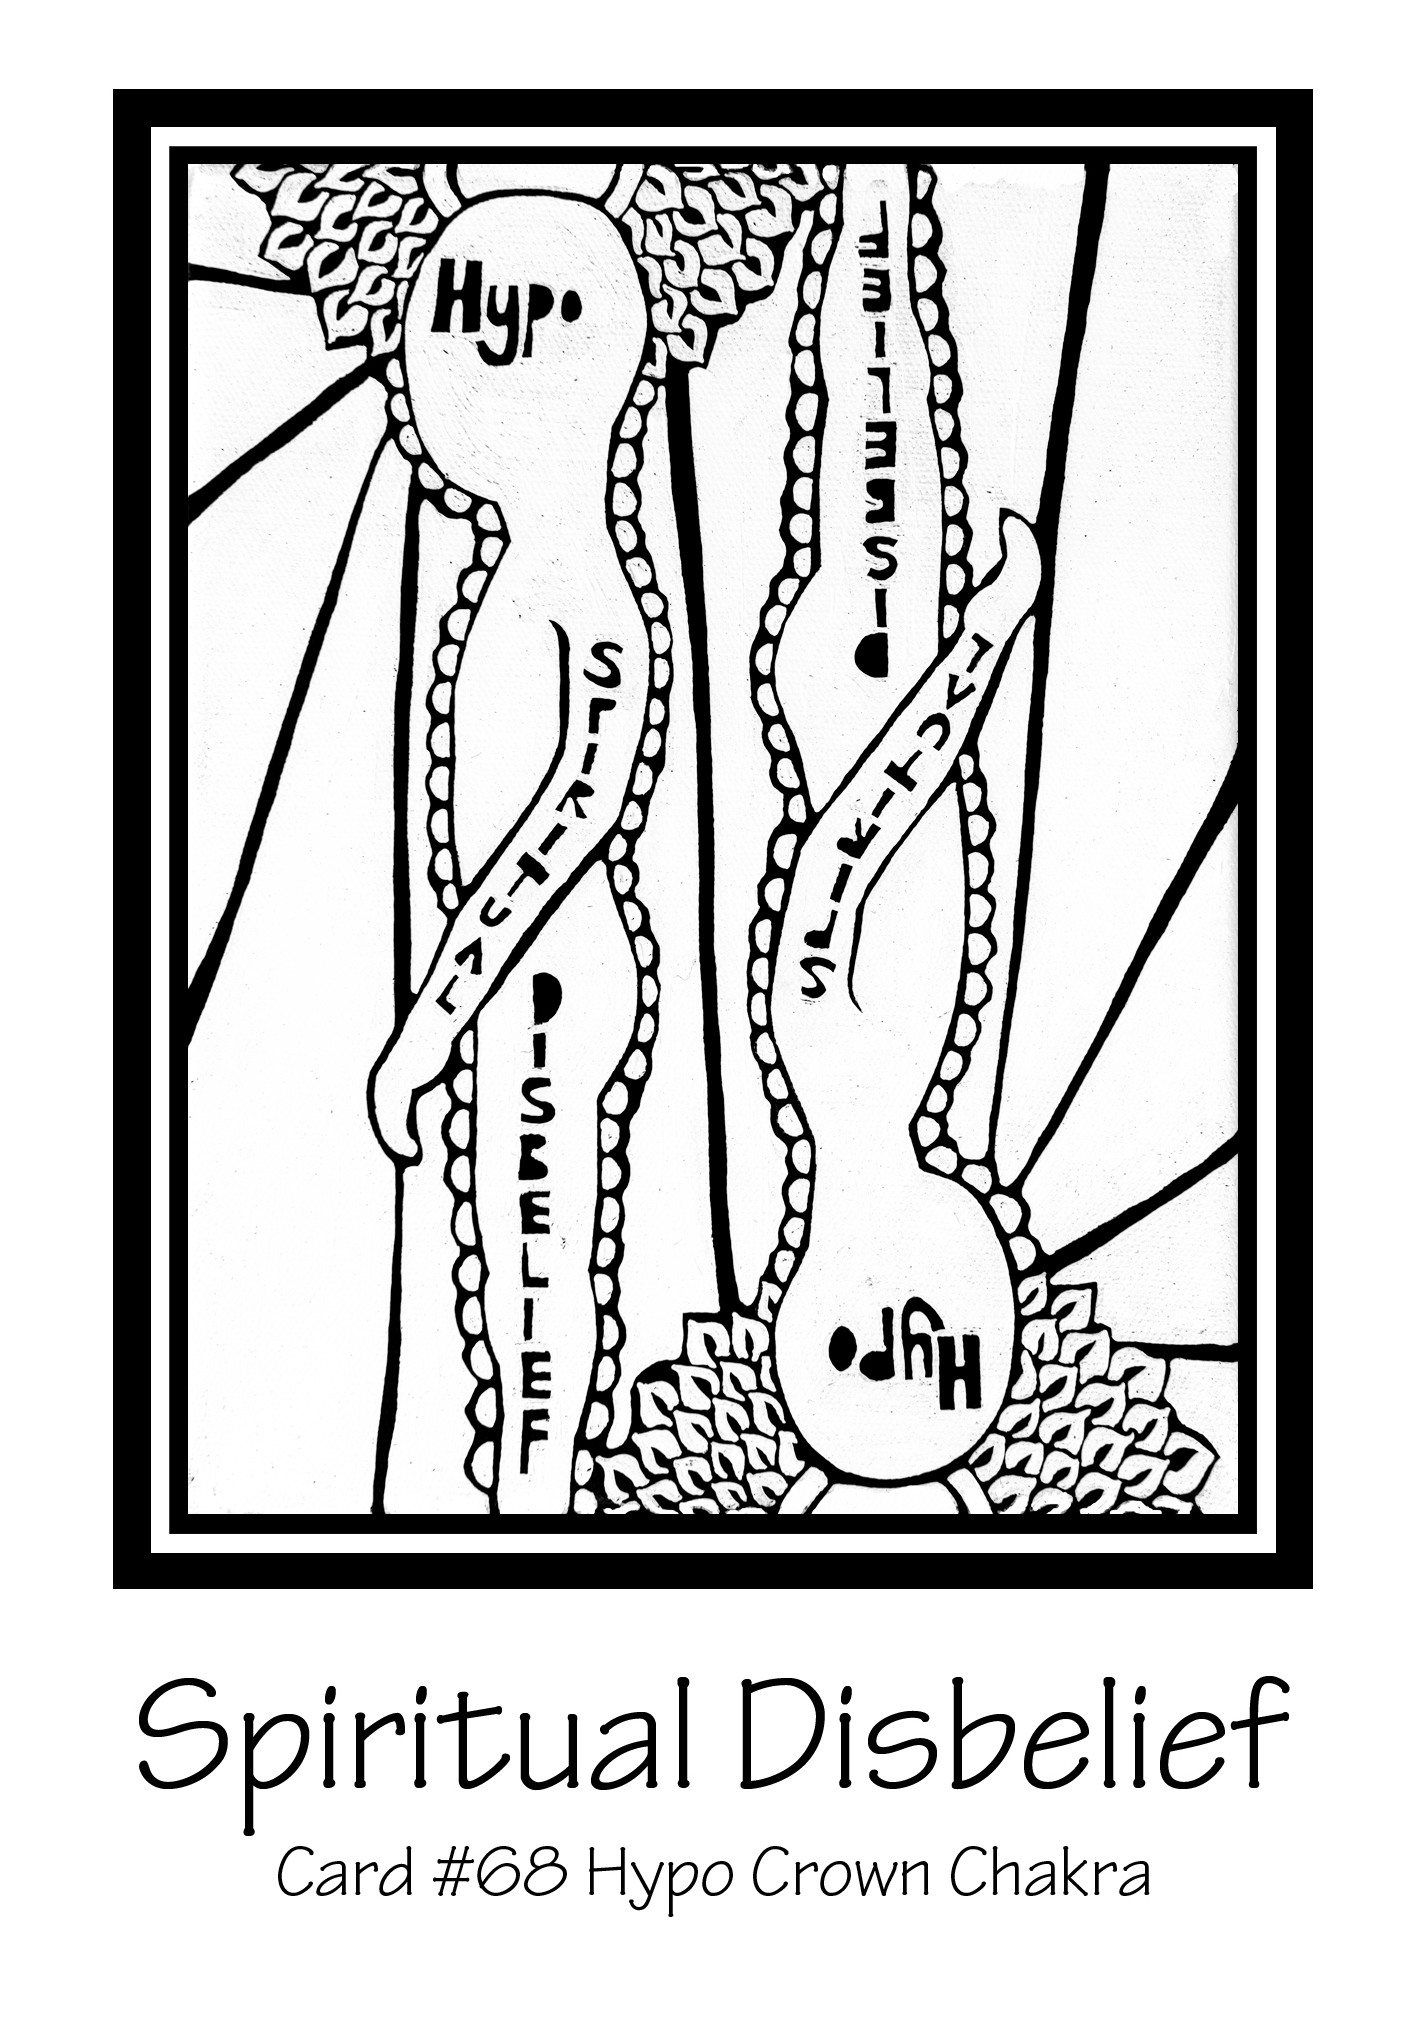 #68 Spiritual Disbelief CB with Bleed.jpg